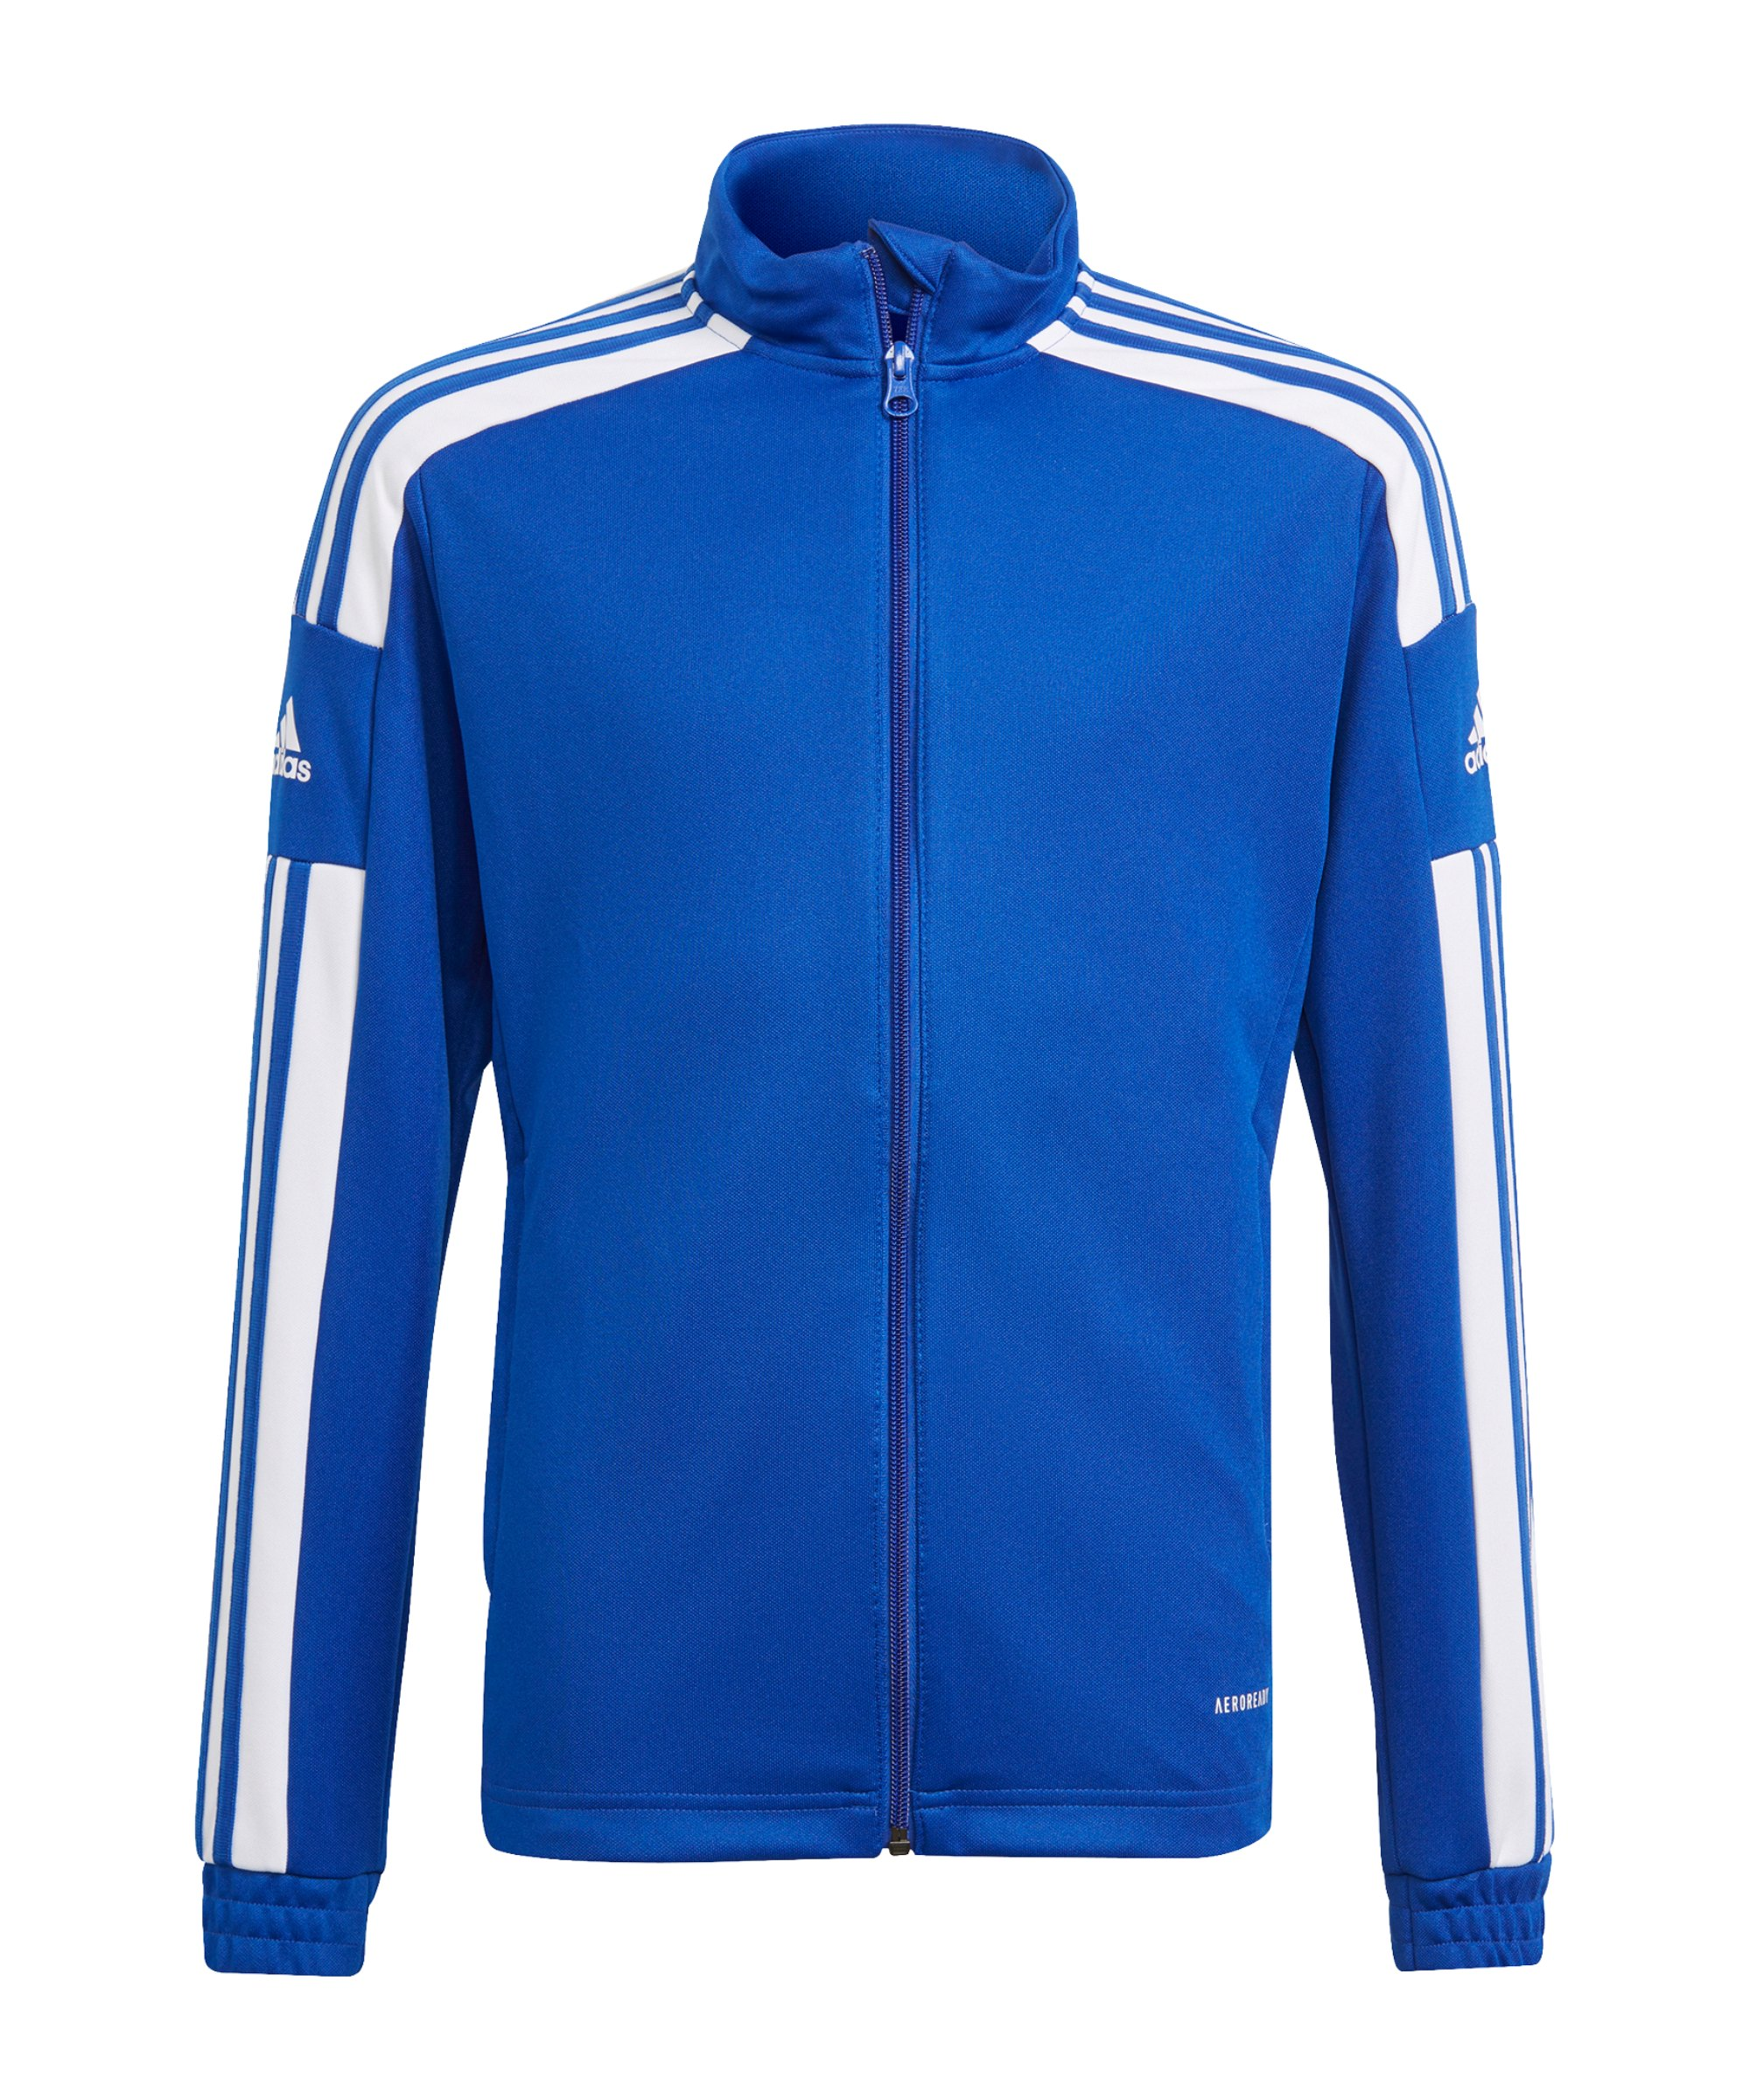 adidas Squadra 21 Trainingsjacke Kids Blau Weiss - blau